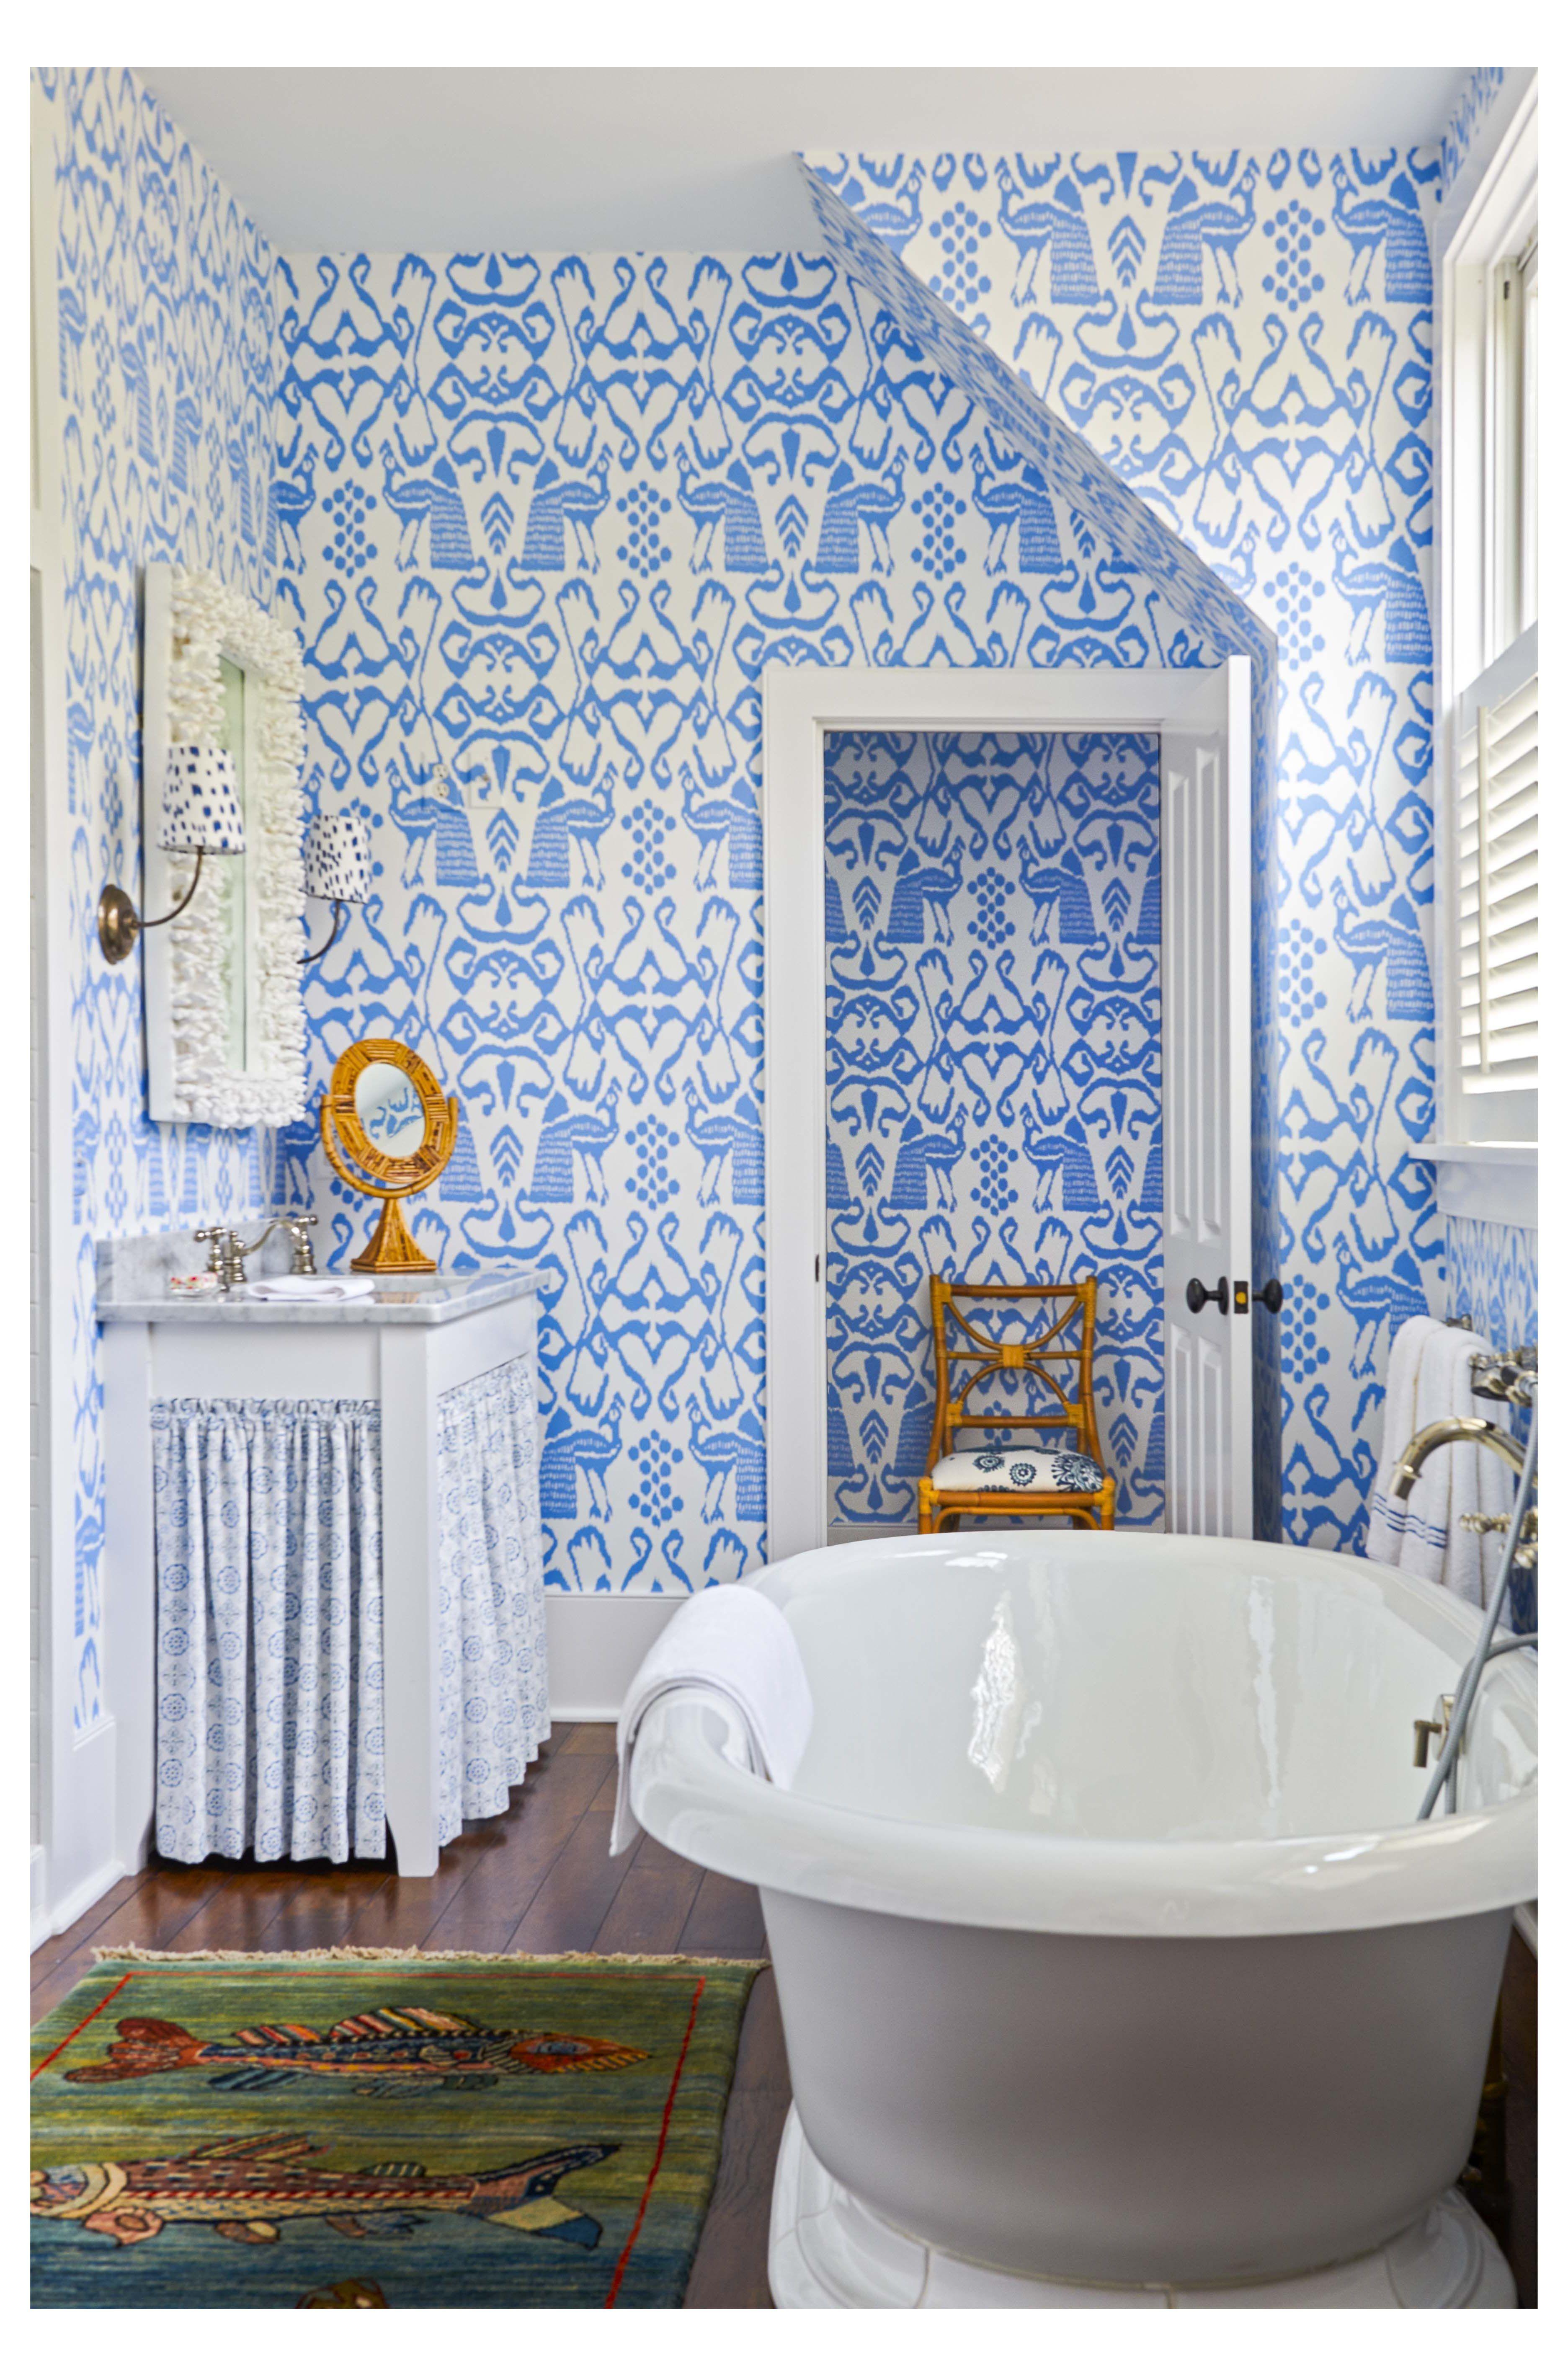 65 Bathrooms So Pretty You Might Never Leave The Tub Makeupstorage In 2020 Bathroom Decor Luxury Bathroom Design Small Bathroom